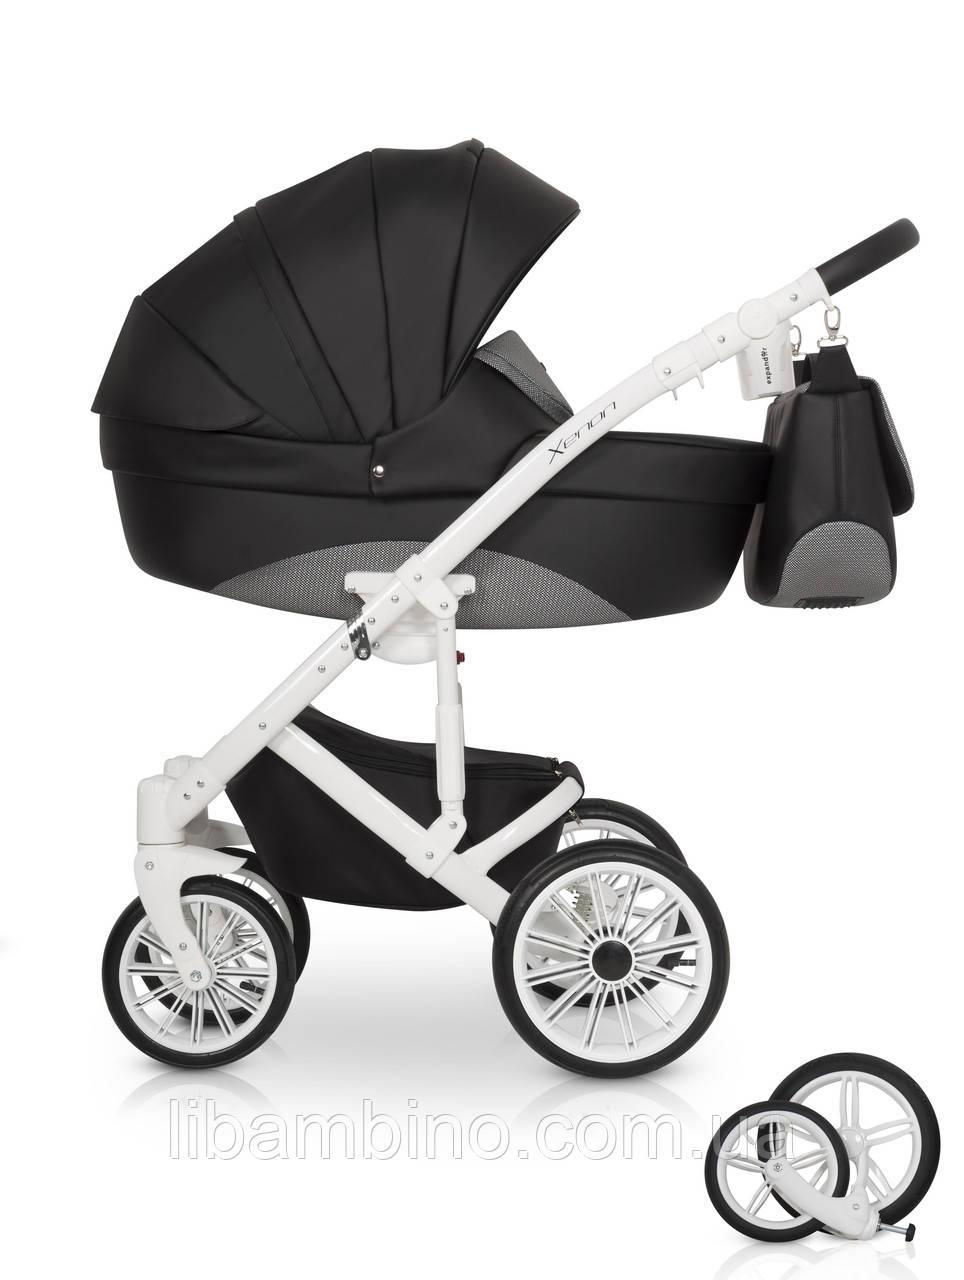 Дитяча універсальна коляска 2 в 1 Expander Xenon 04 Carbon